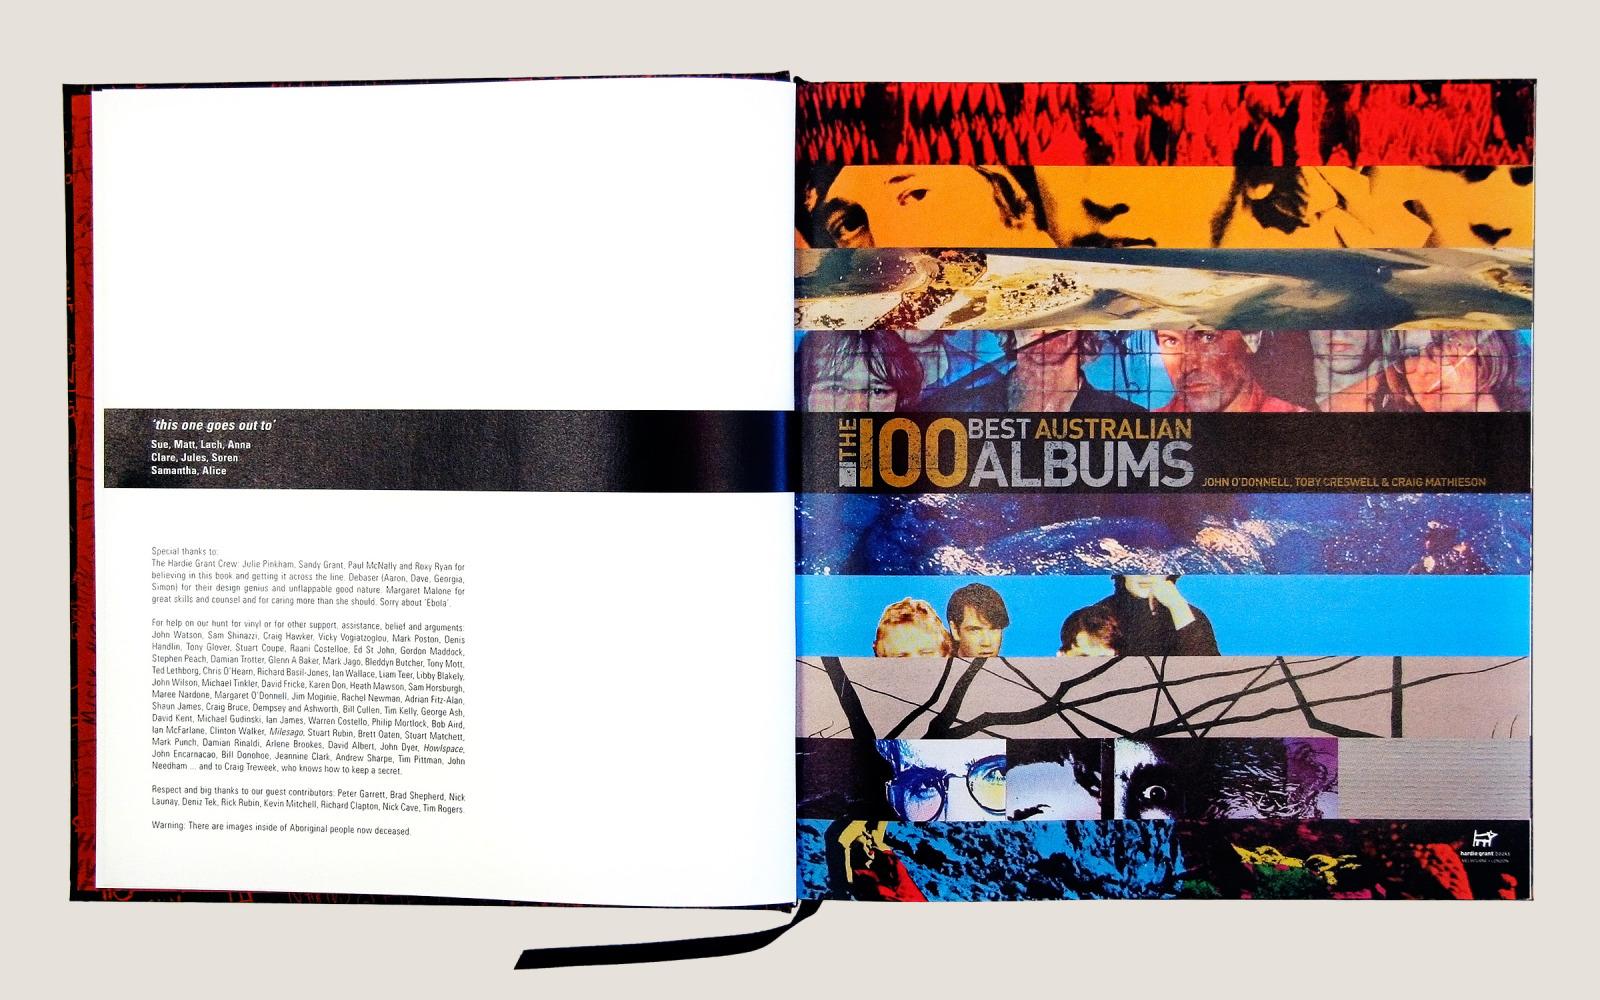 100ausalbums_03